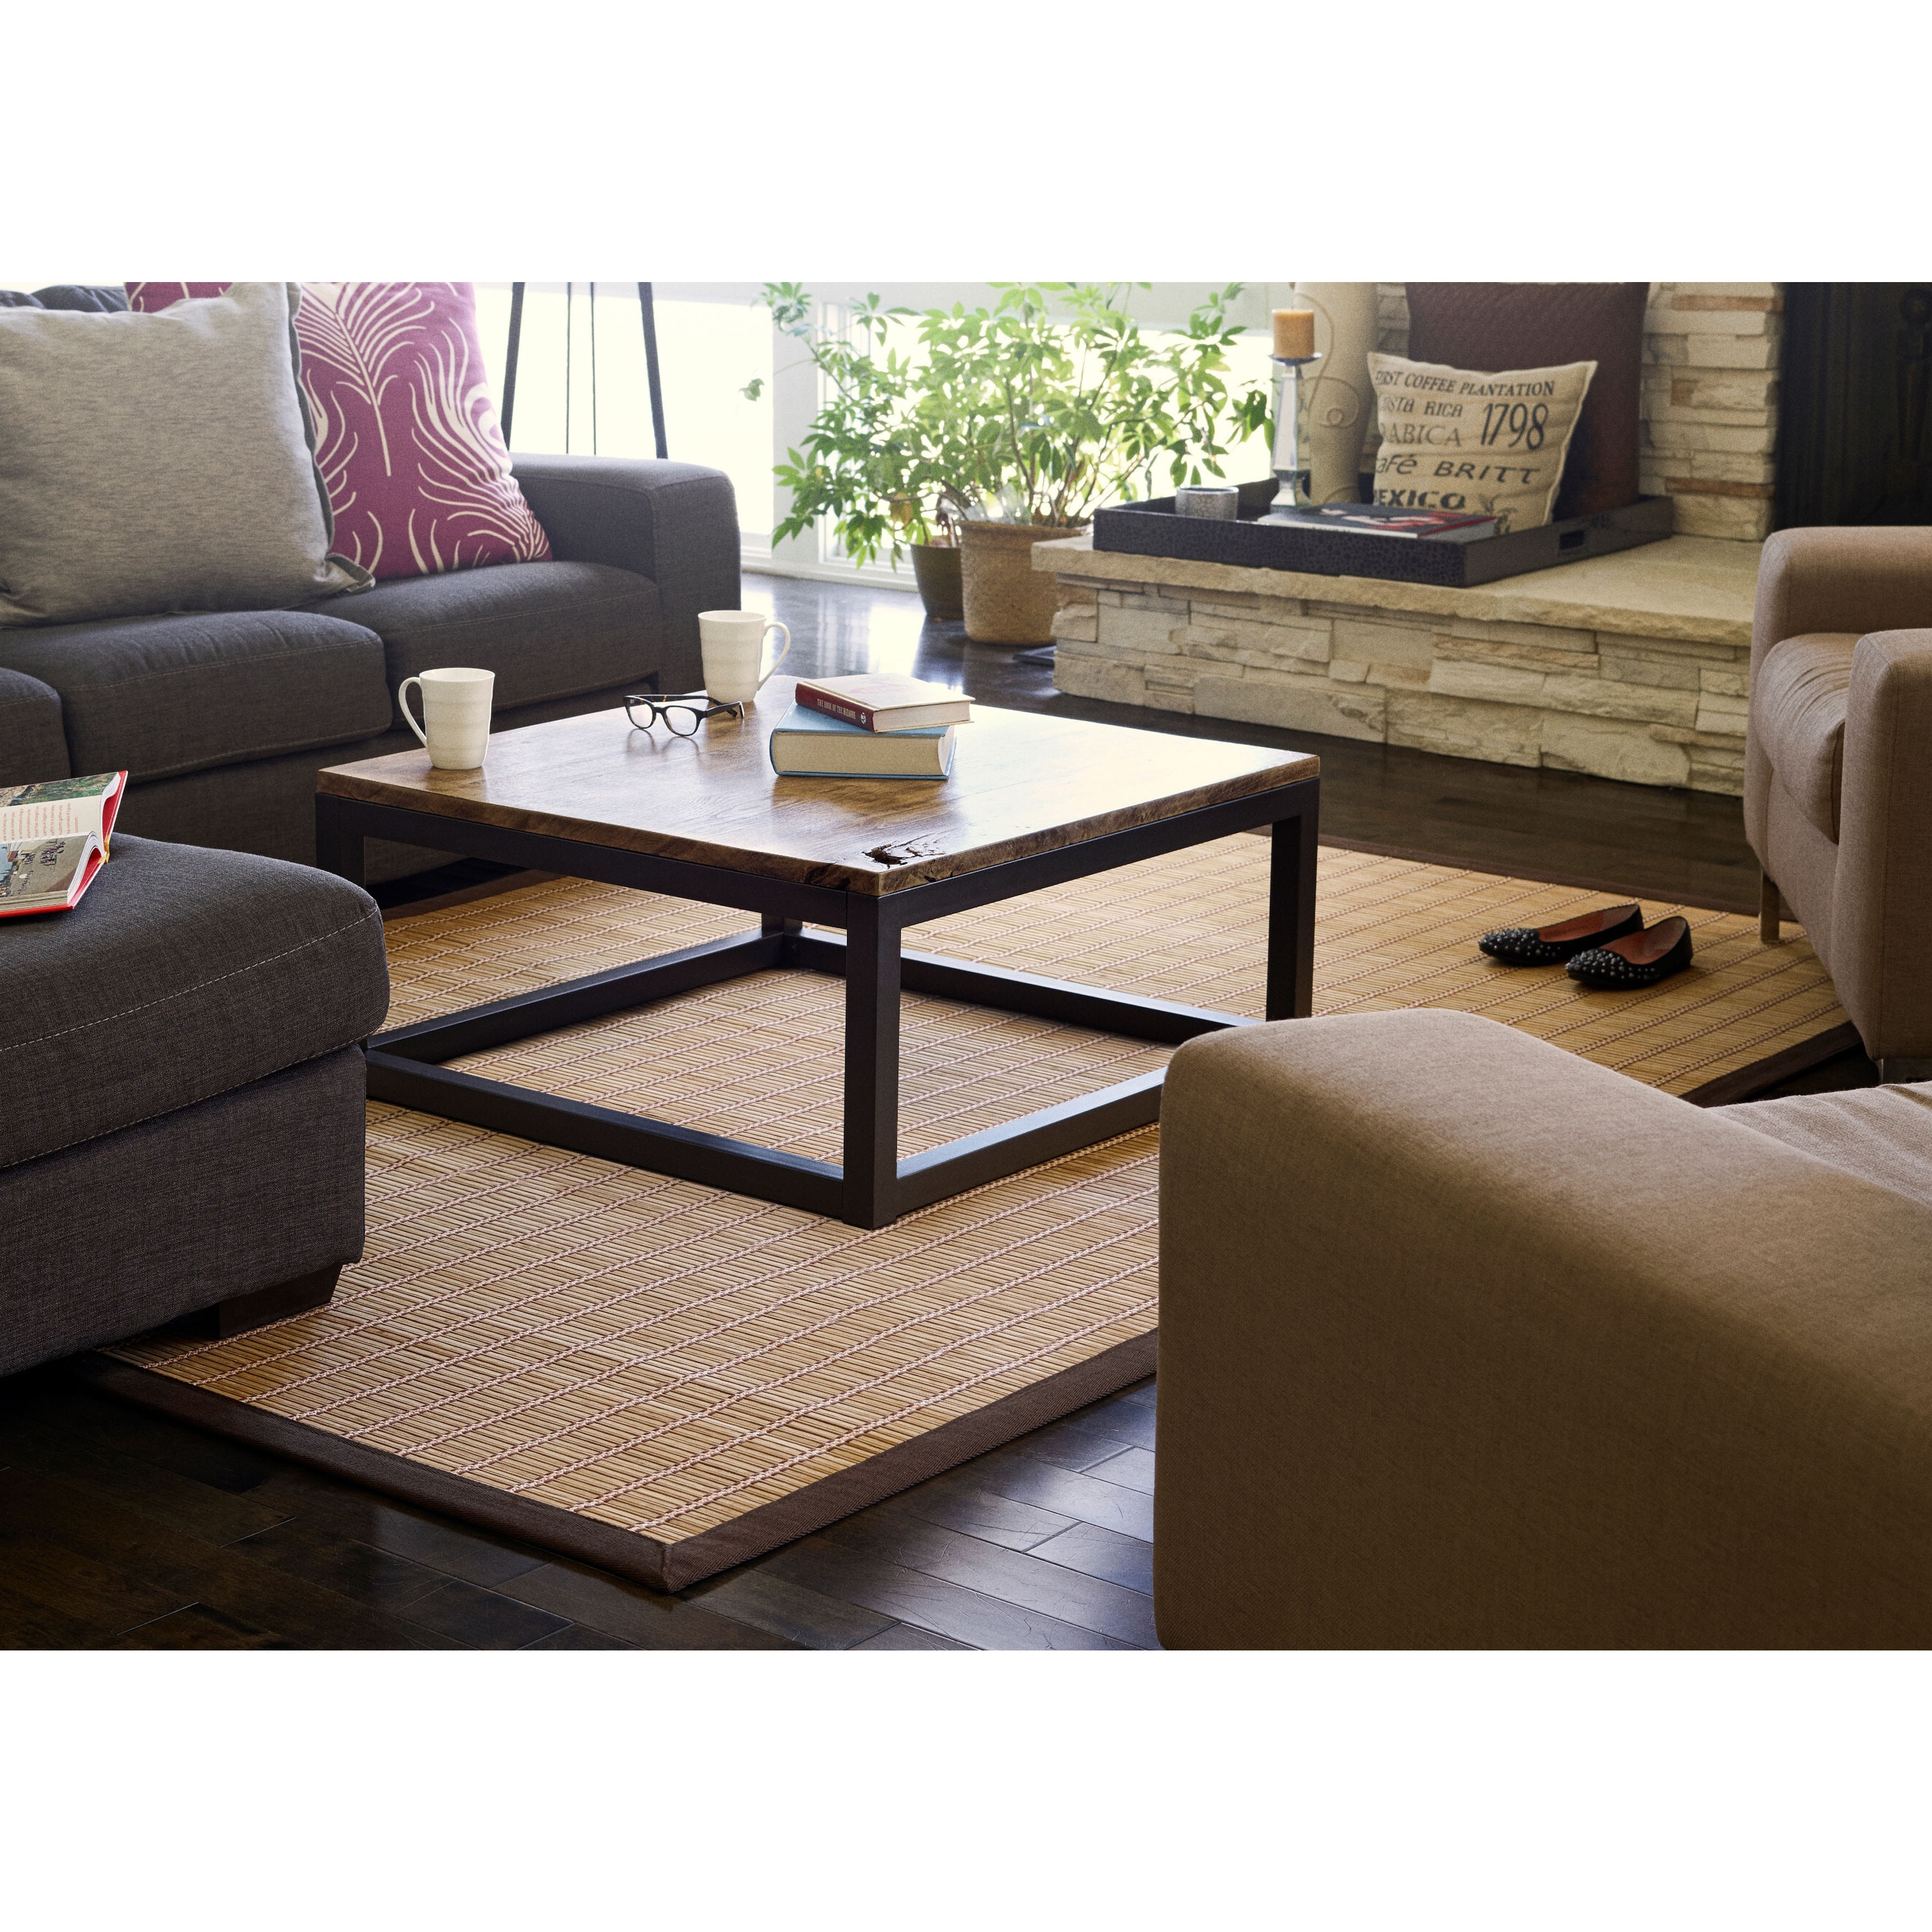 Jani Zenith Bamboo Rug with Brown Border (4' x 6') - 4' x...